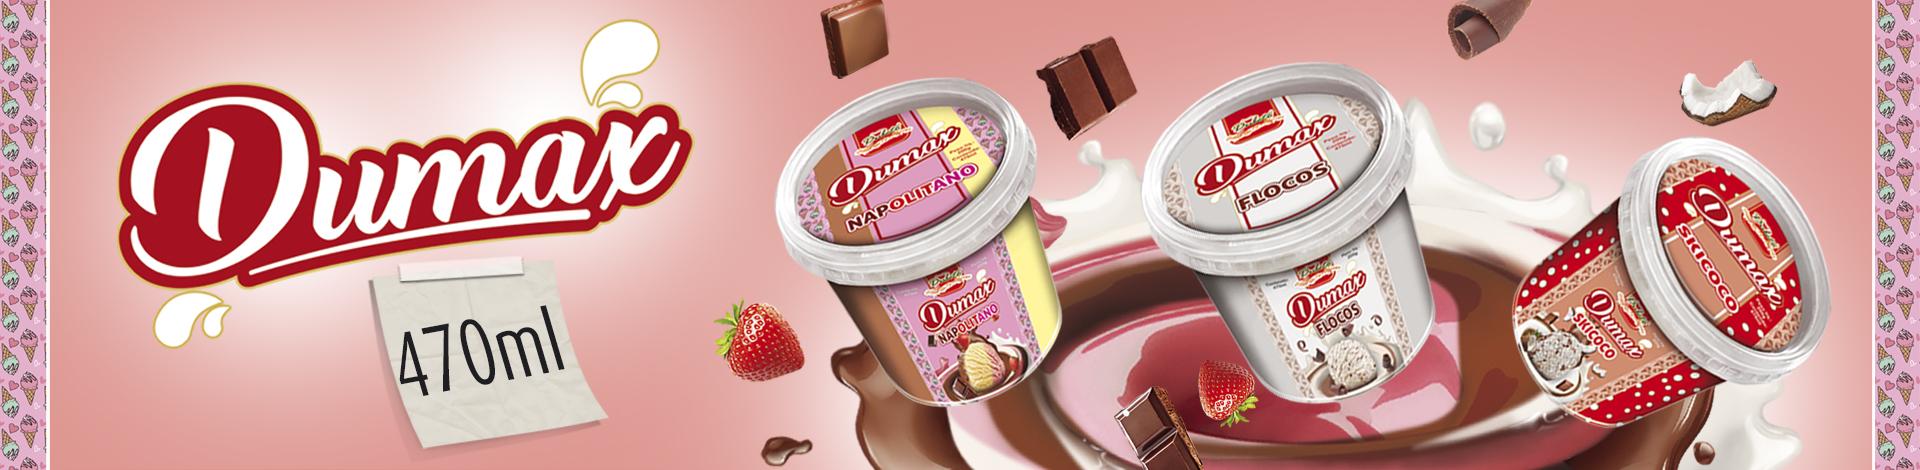 Dumax 470 ml